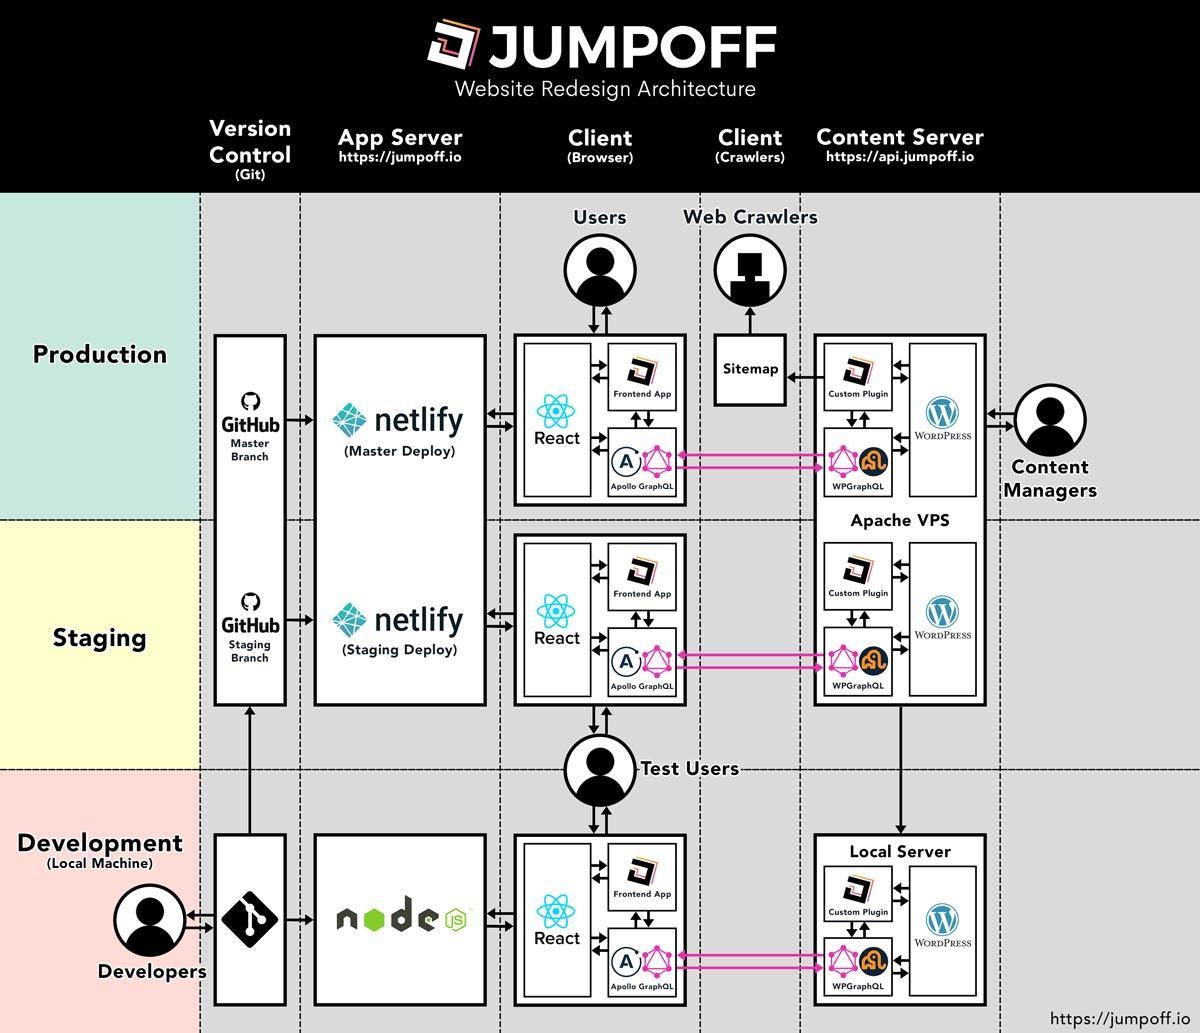 JumpOff - Rebuilding JumpOff io With React, Netlify, GraphQL